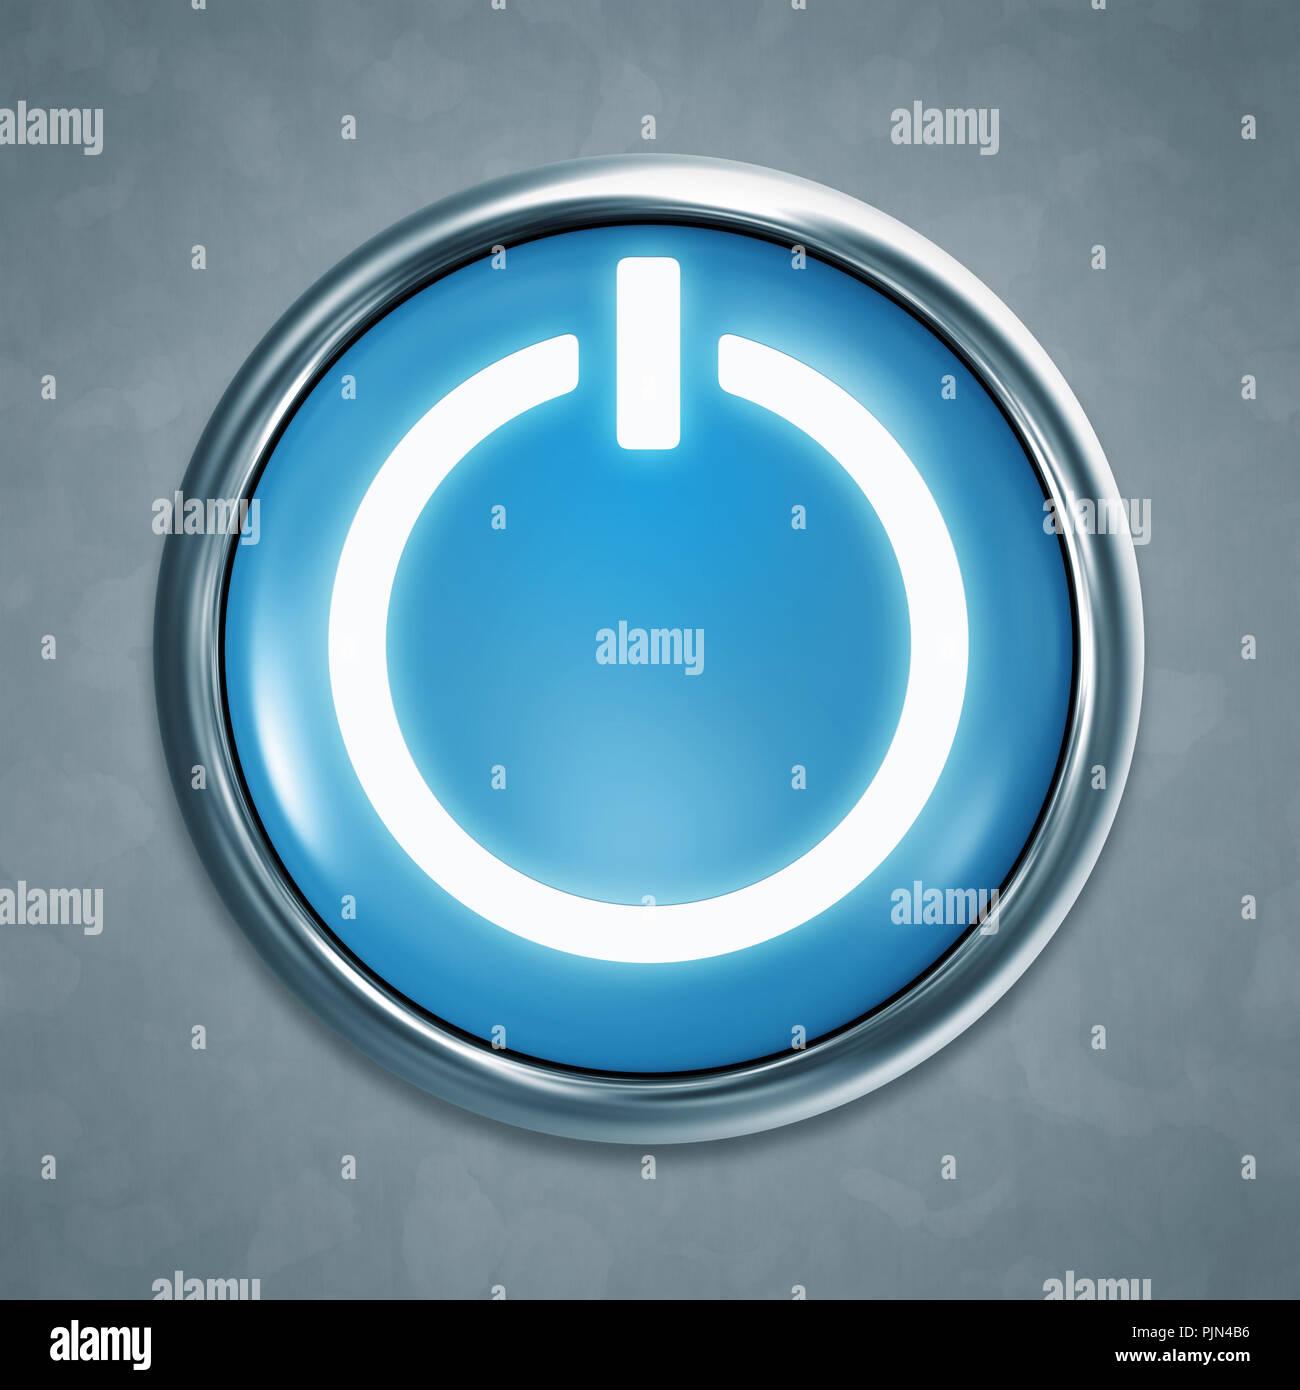 Un botón azul de inicio antes de fondo gris, Ein blauer Startknopf grauem Hintergrund vor Foto de stock